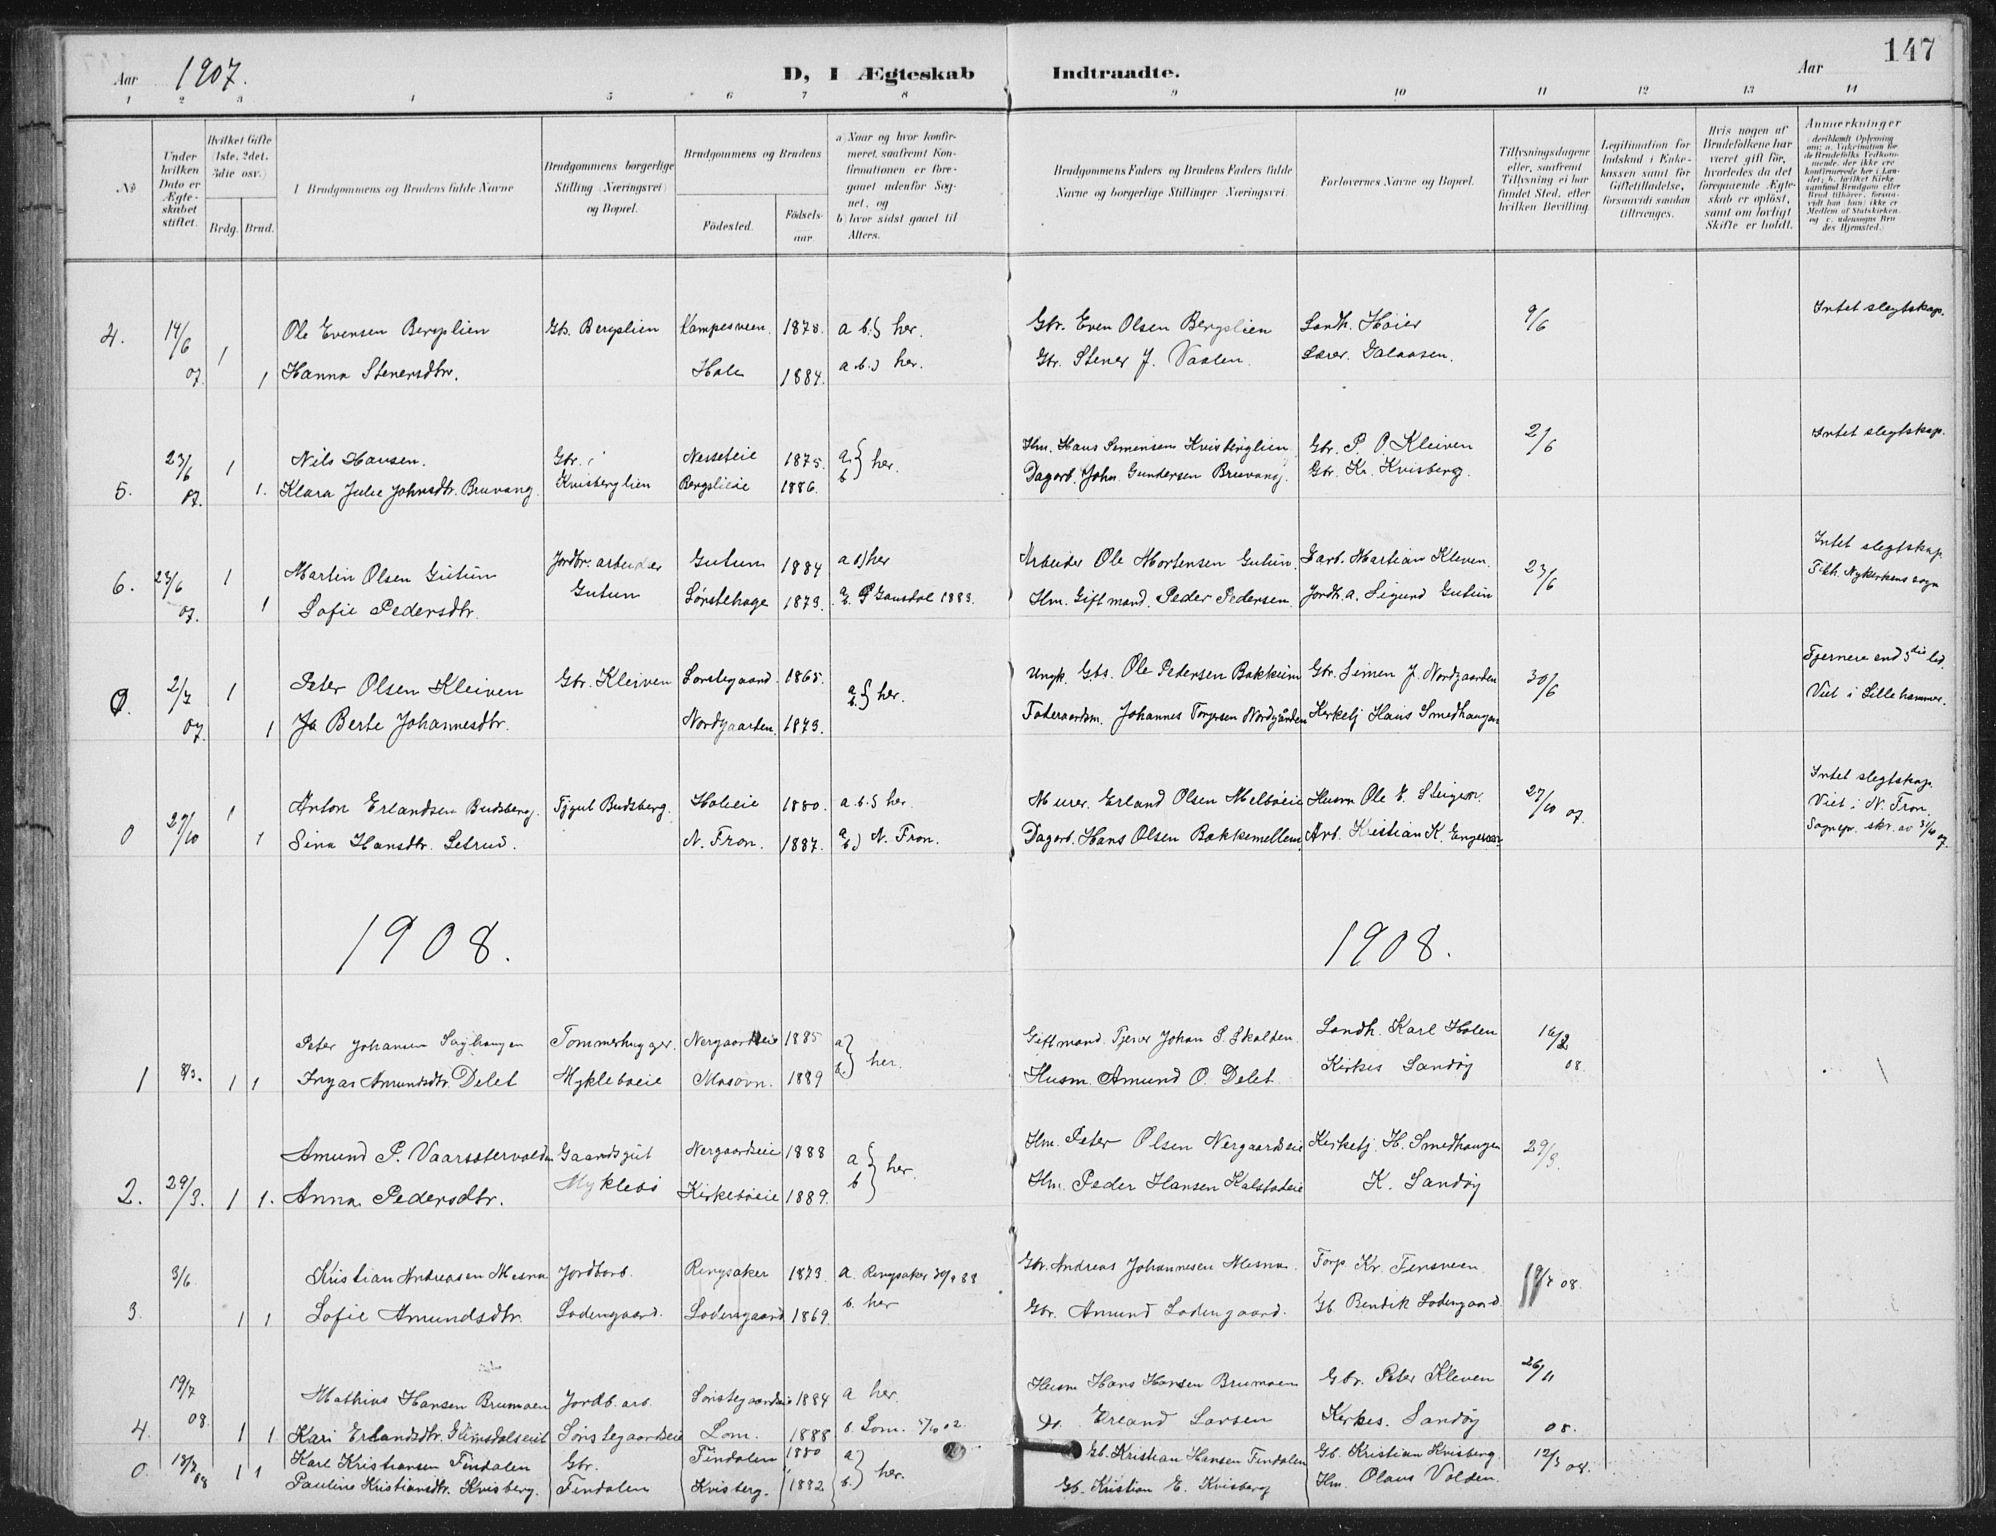 SAH, Vestre Gausdal prestekontor, Klokkerbok nr. 4, 1898-1939, s. 147